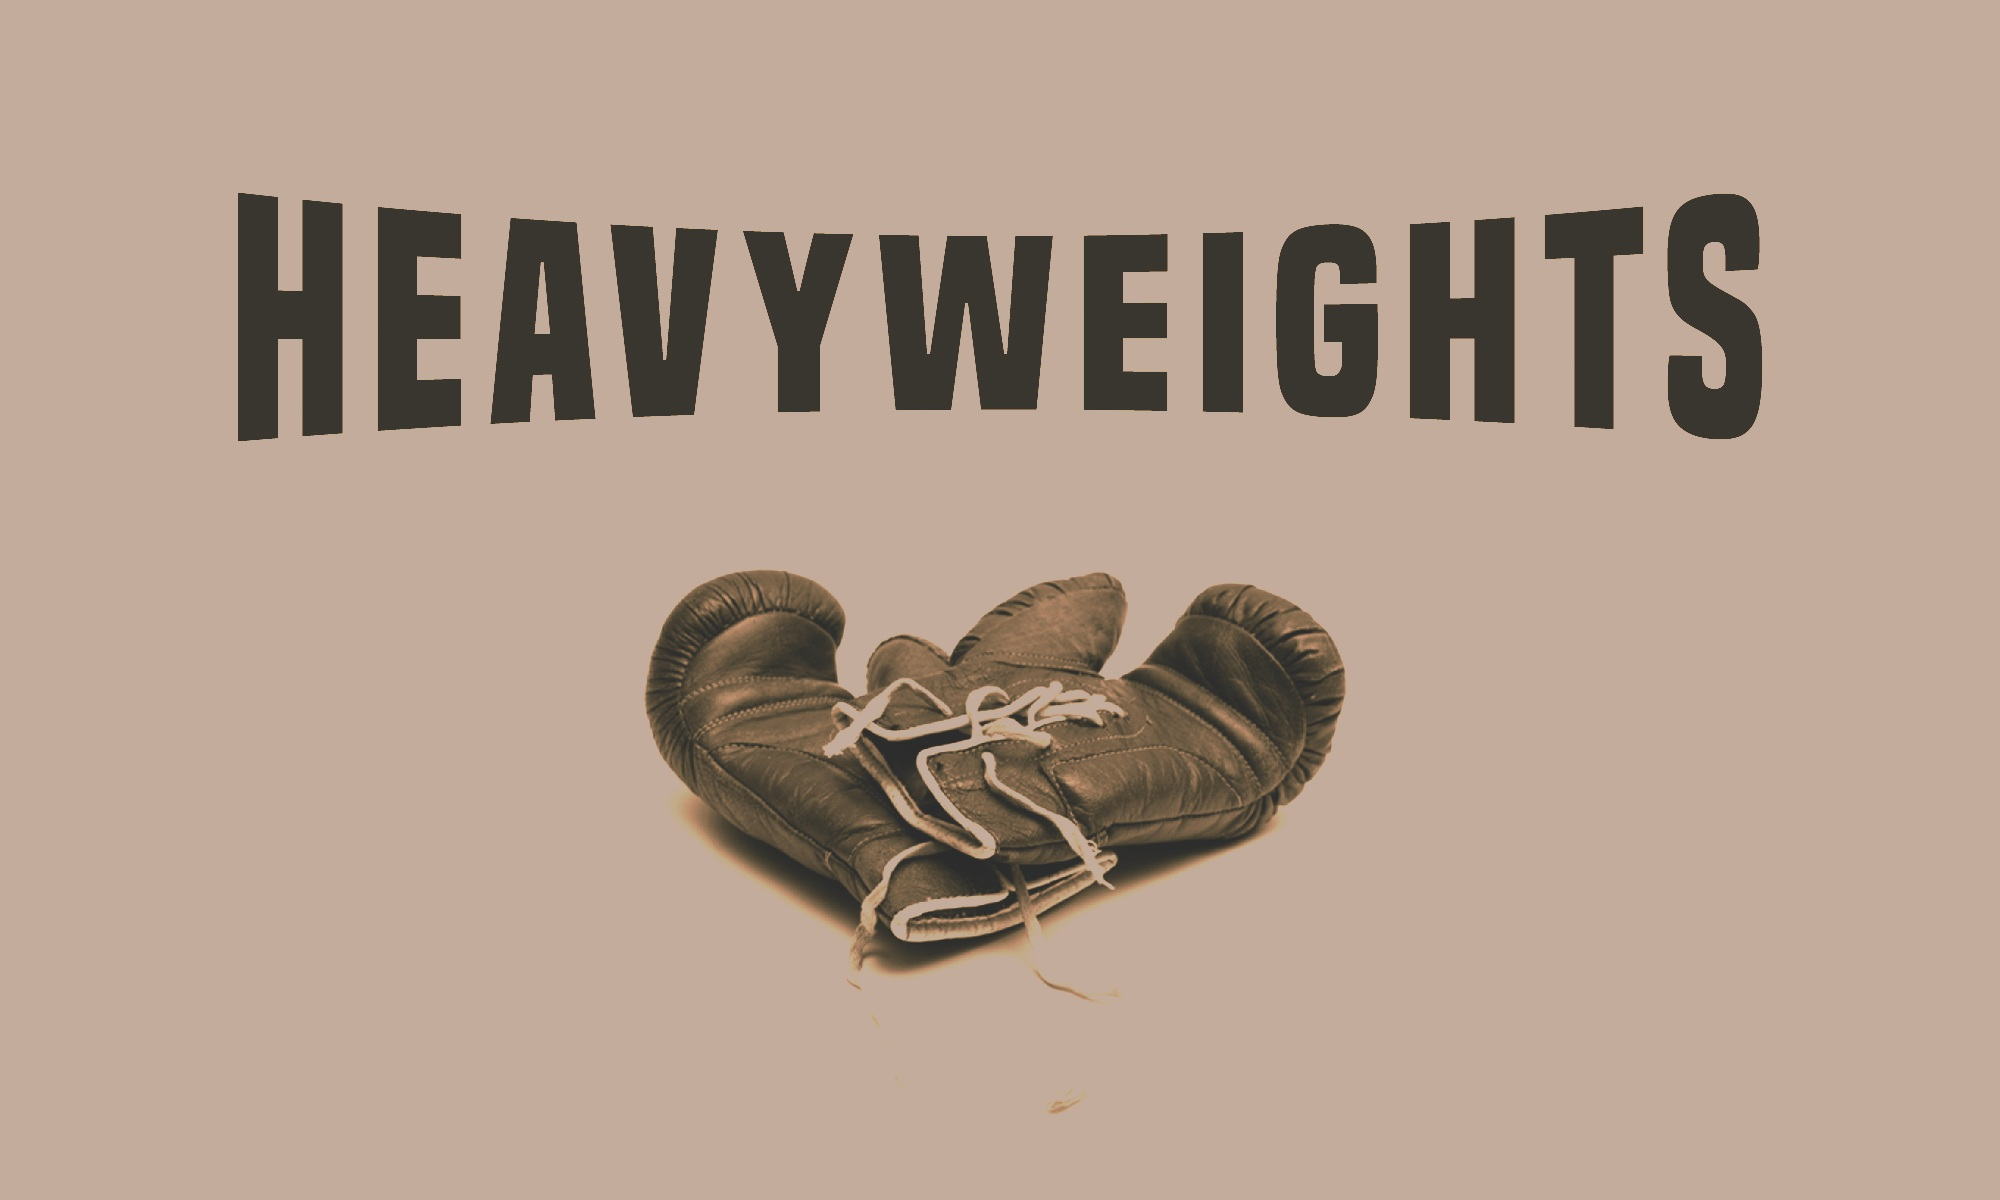 HEAVYWEIGHTS | WEEK 1 - 3.10.19 | Phillip Martin